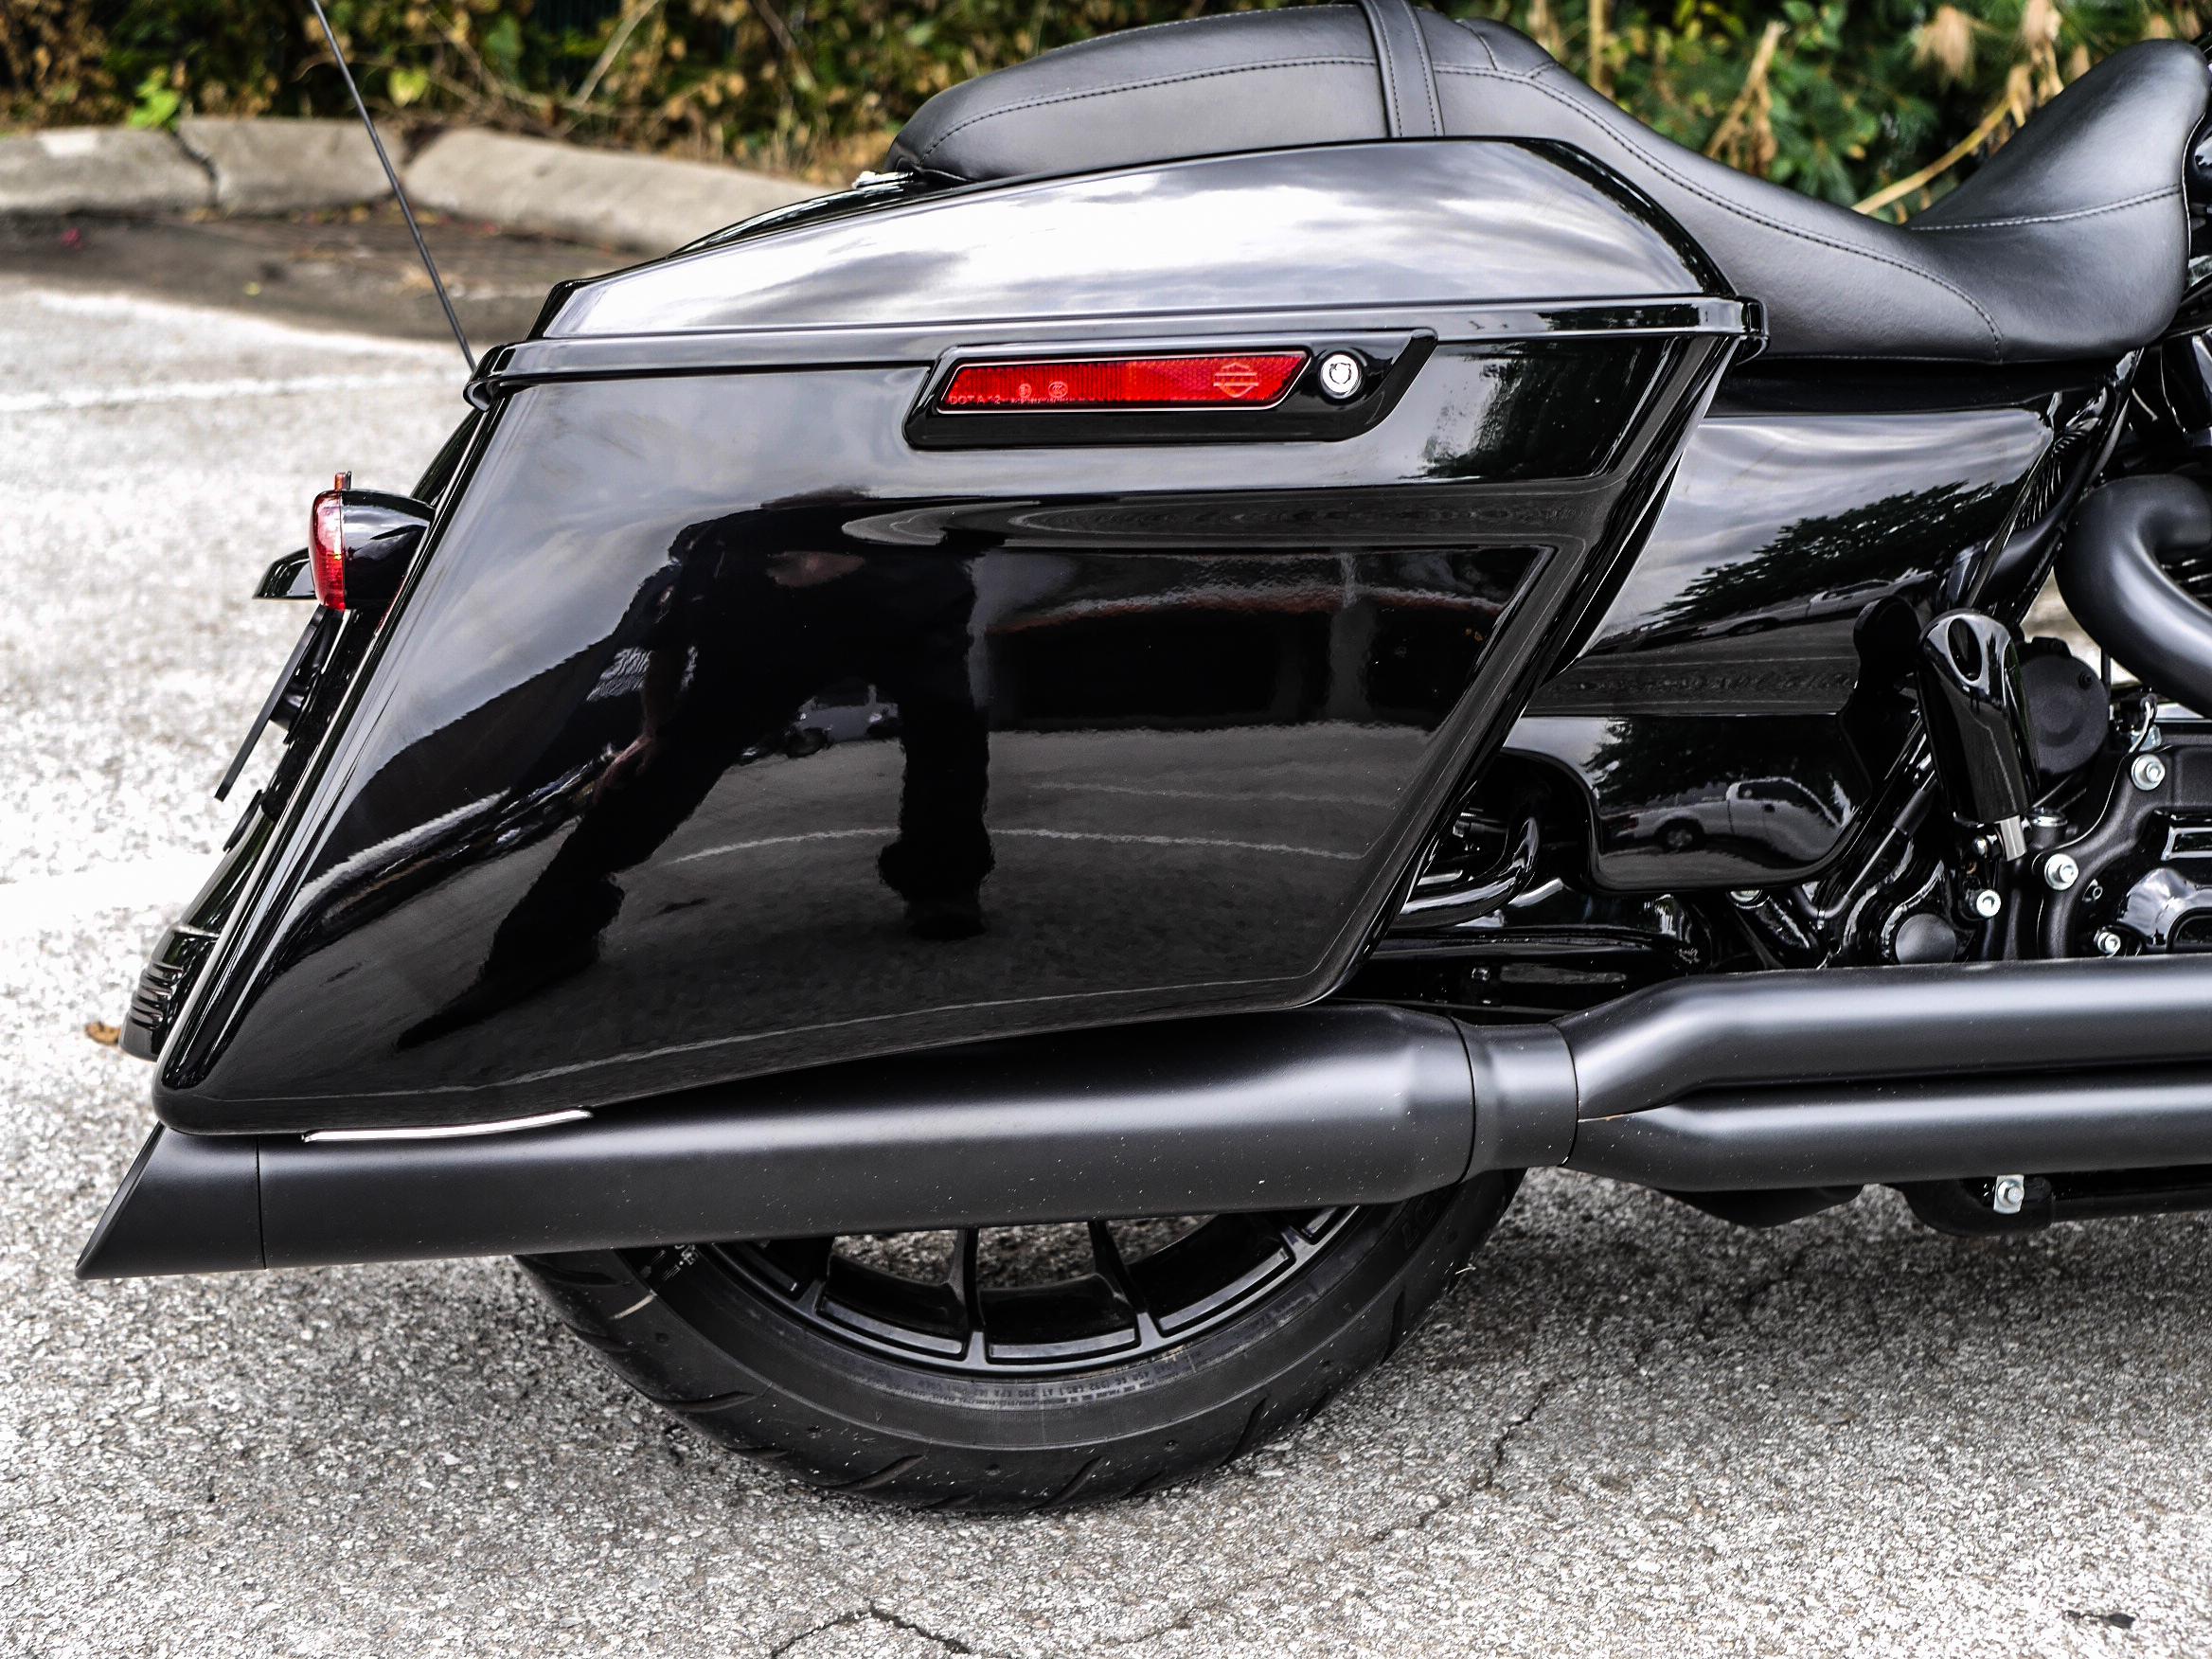 New 2019 Harley-Davidson Street Glide Special